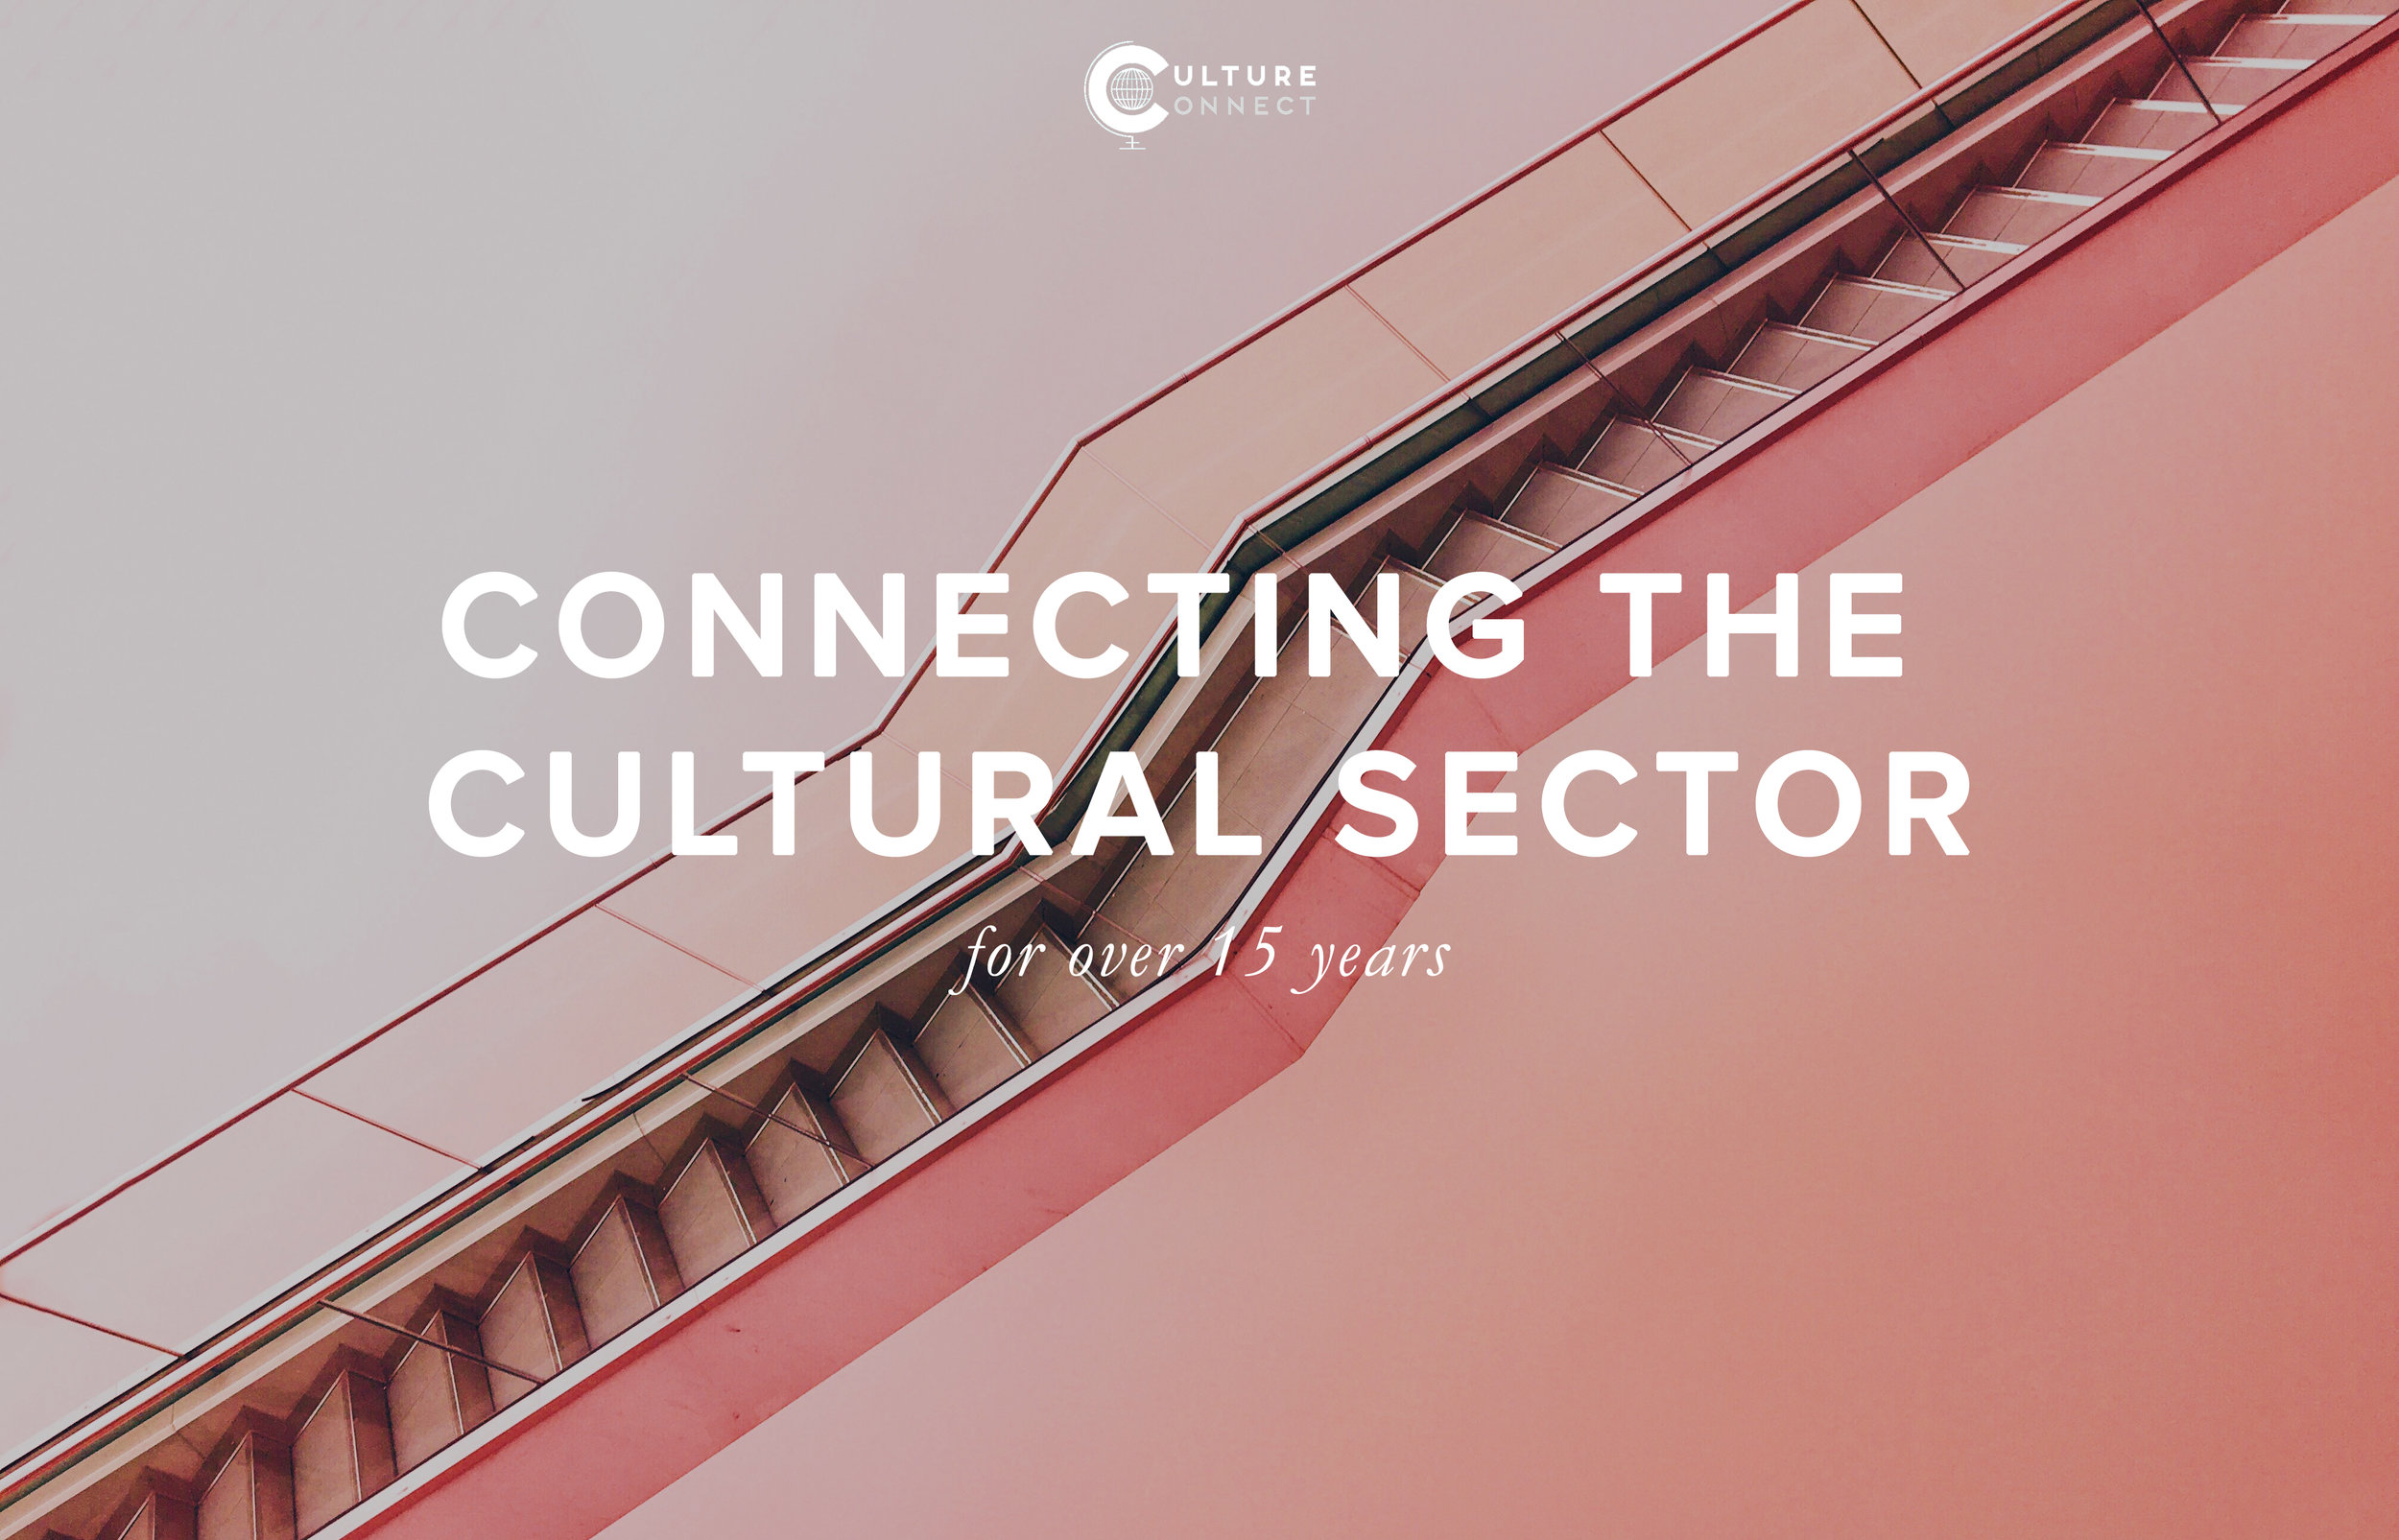 CC-visuel-connecting-logo.jpg